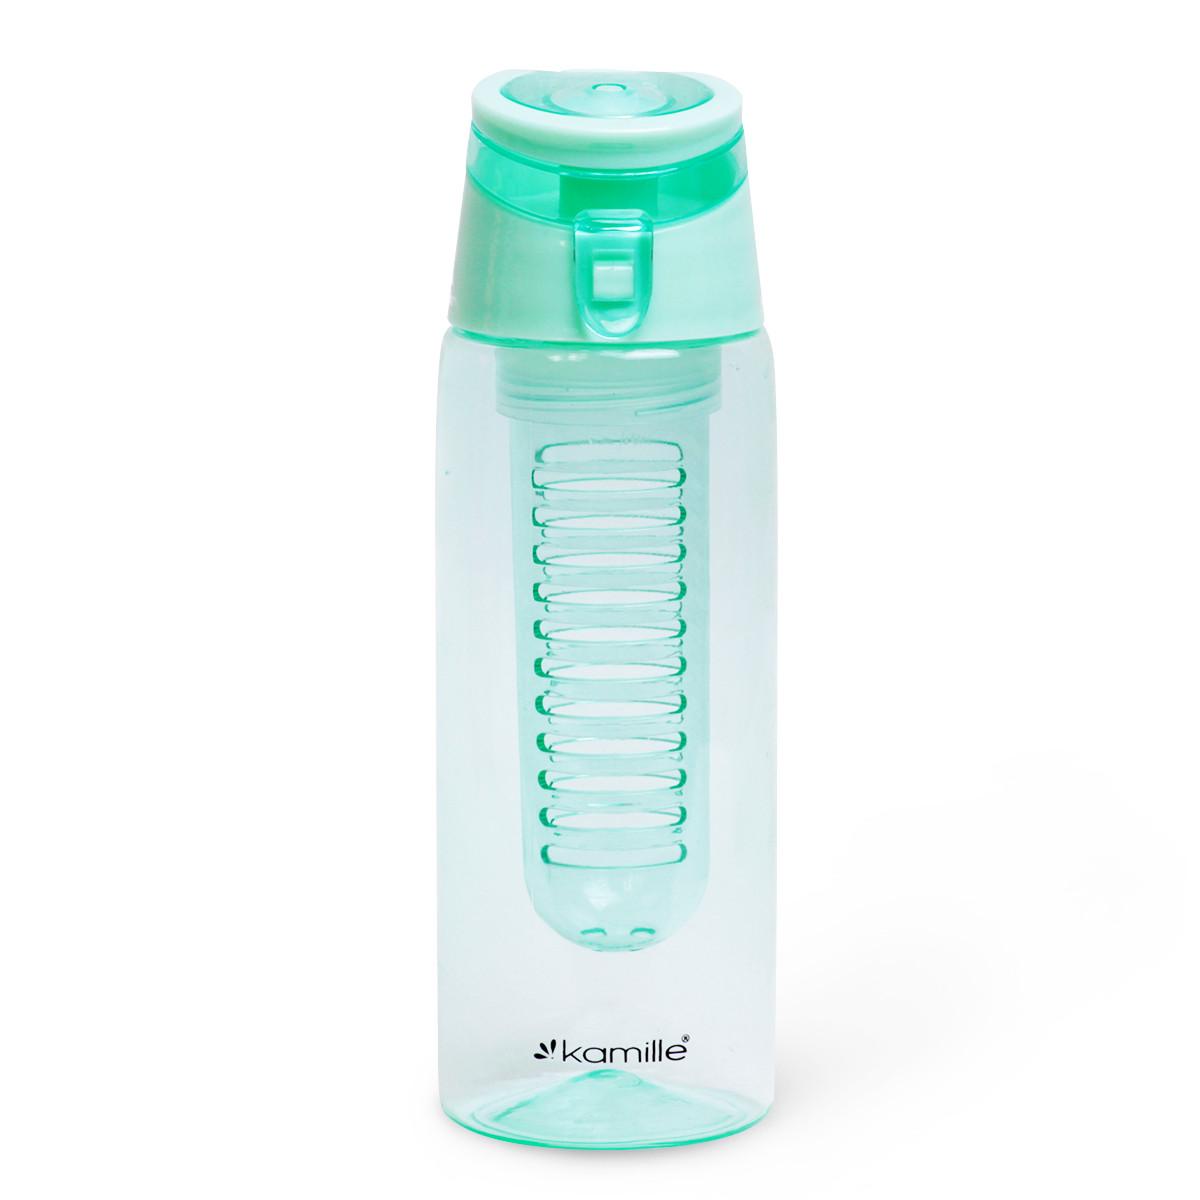 Спортивная бутылка для воды Kamille Бирюзовый 660ml из пластика KM-2303BR